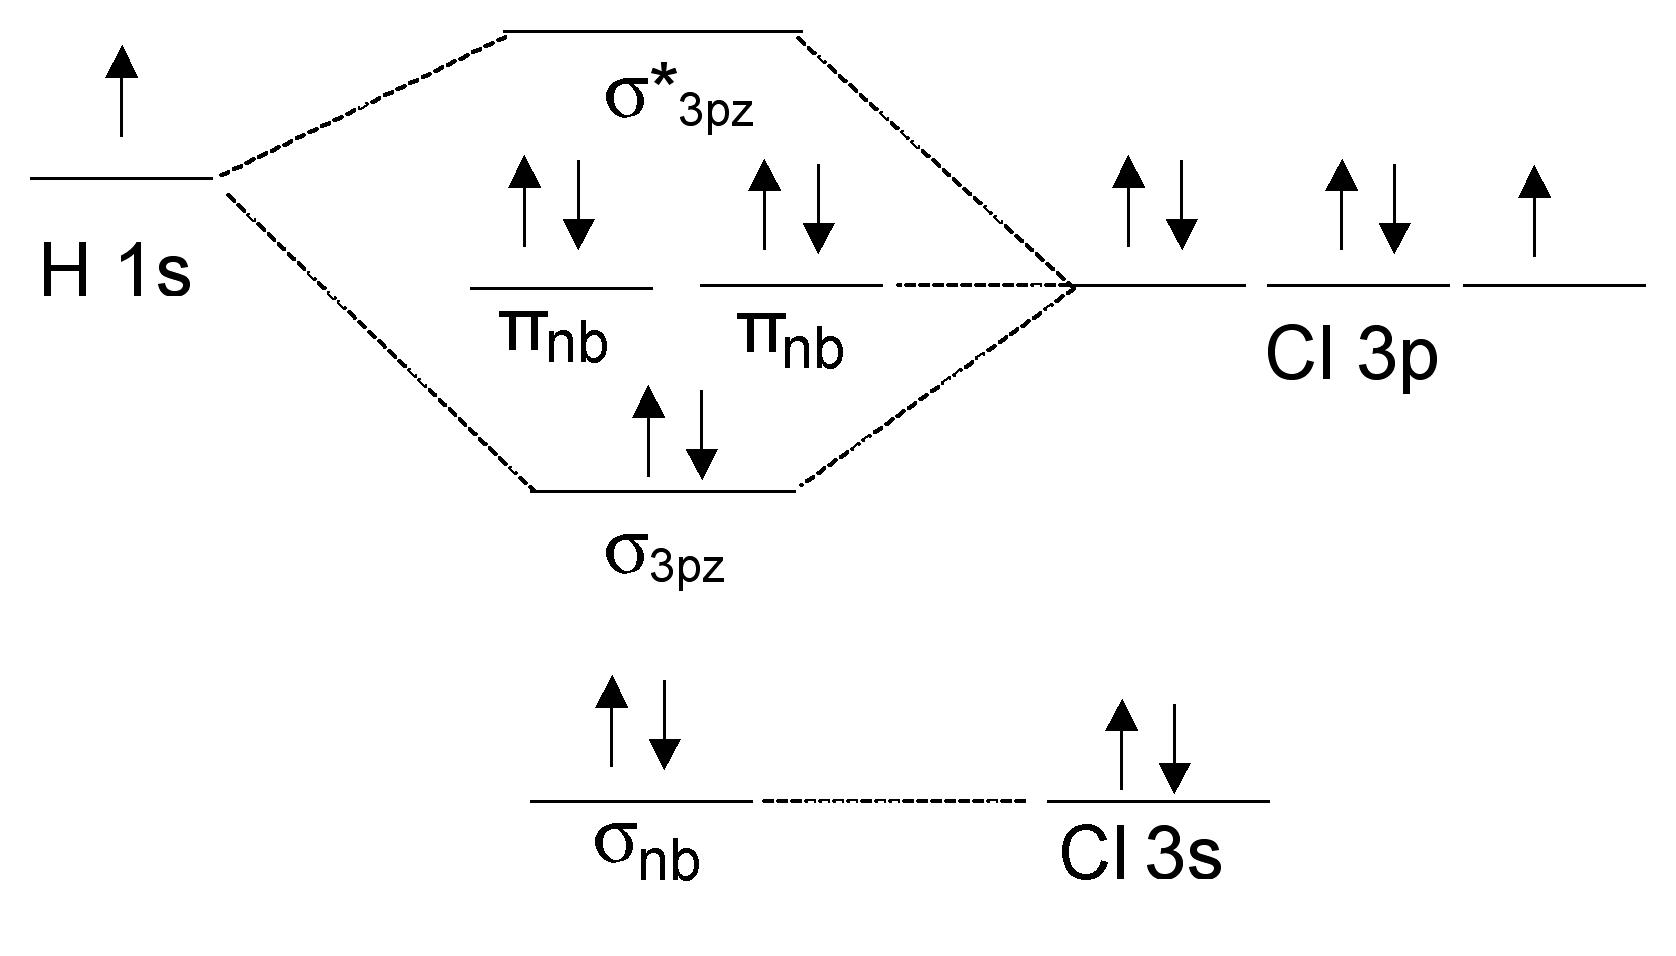 Molecular Orbital Diagram Theoretical Chemistry Energetic Placement Of Atomic Orbitals In